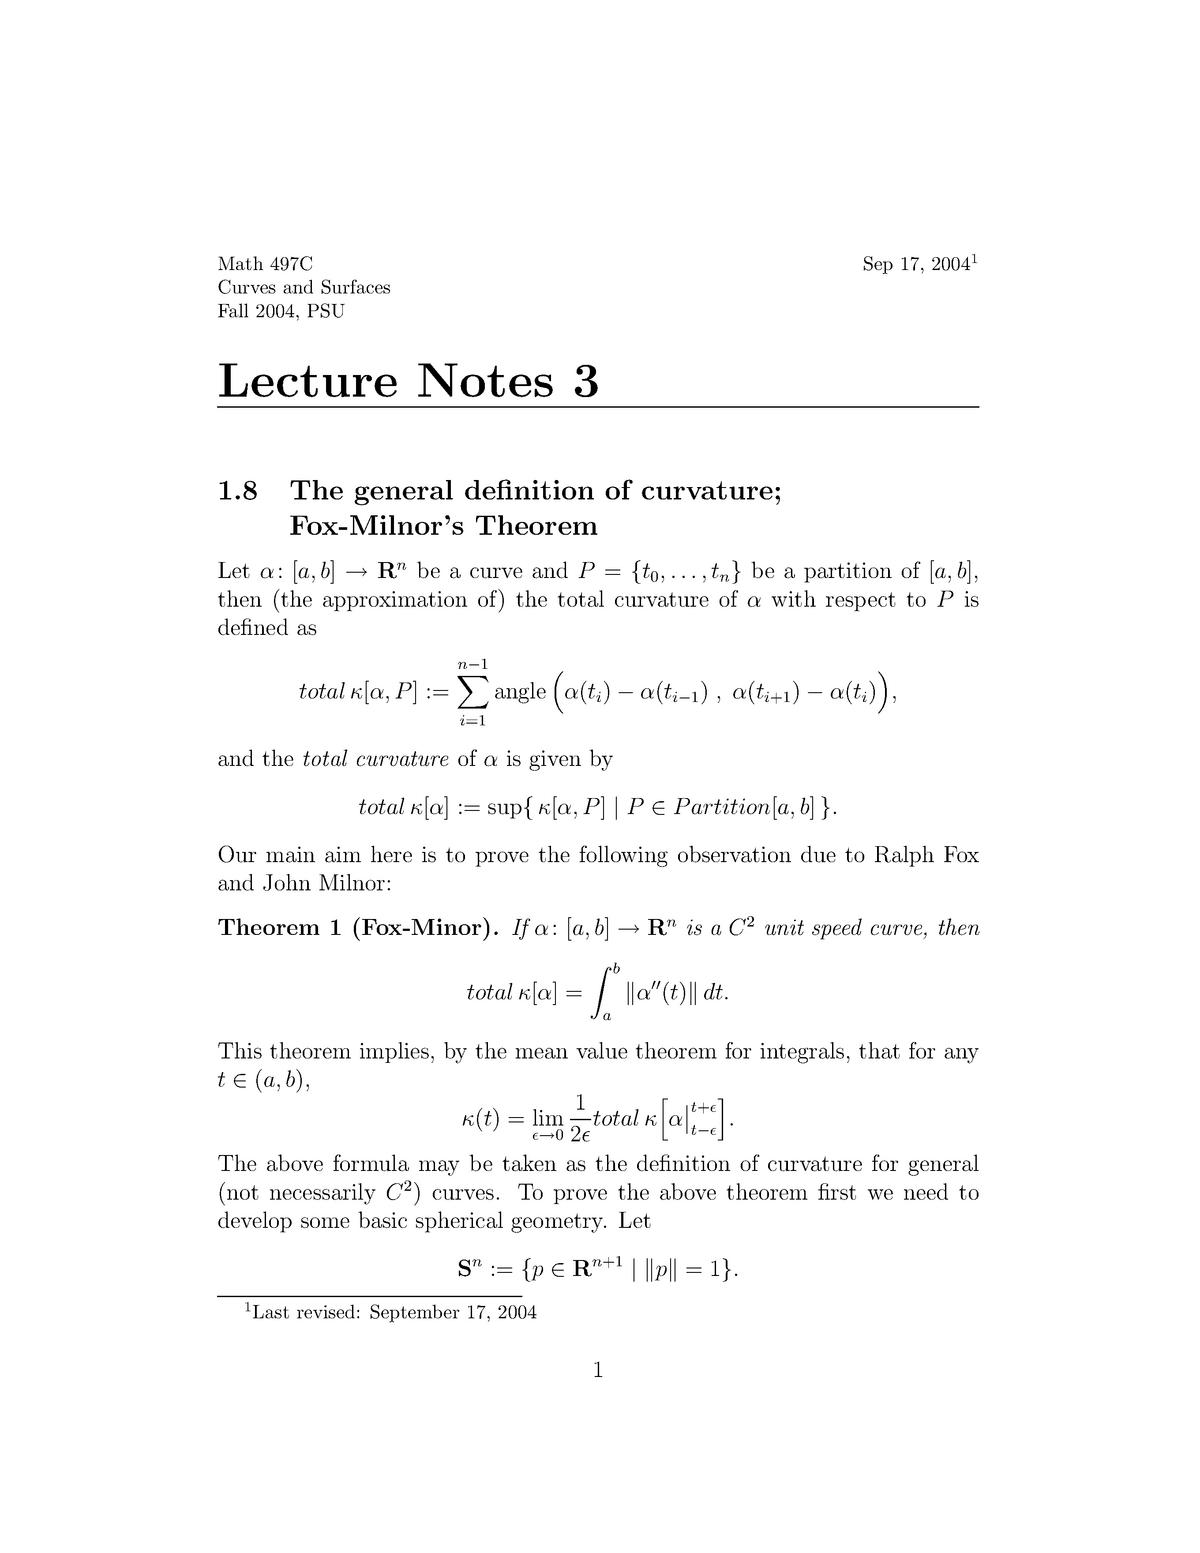 Summary - The general definition of curvature fox-milnor's - StuDocu